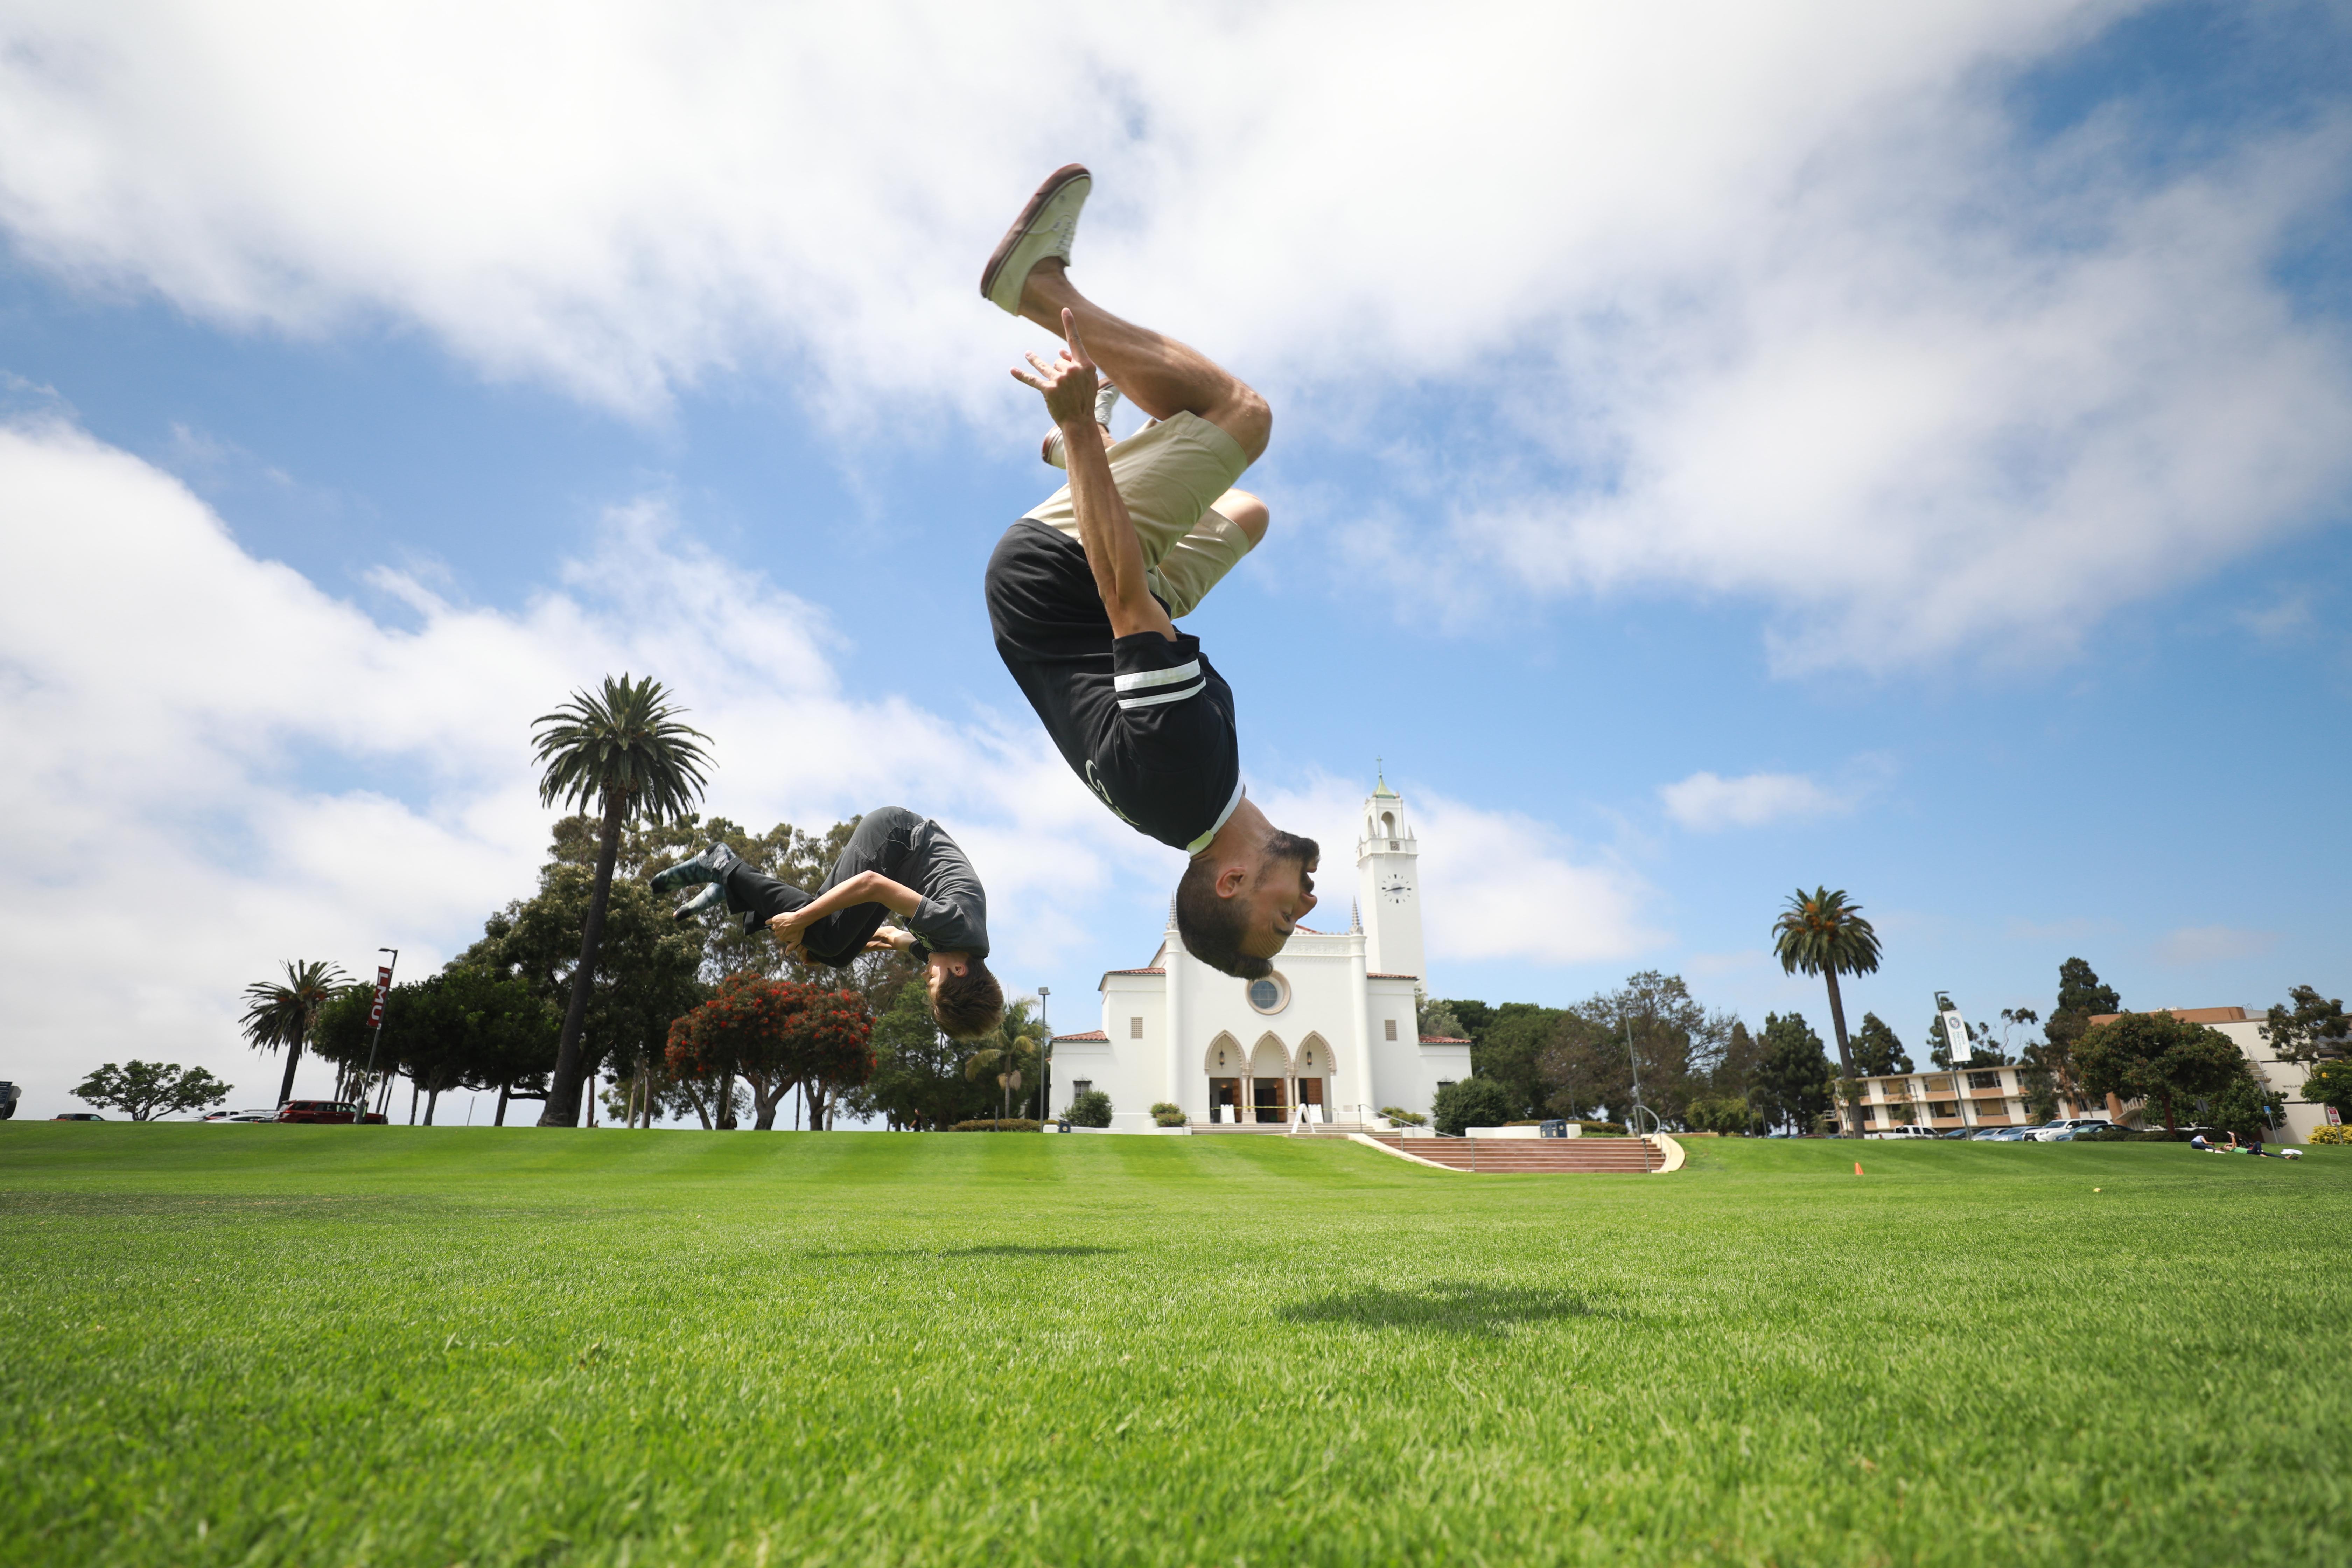 Kid doing a backflip on grass field